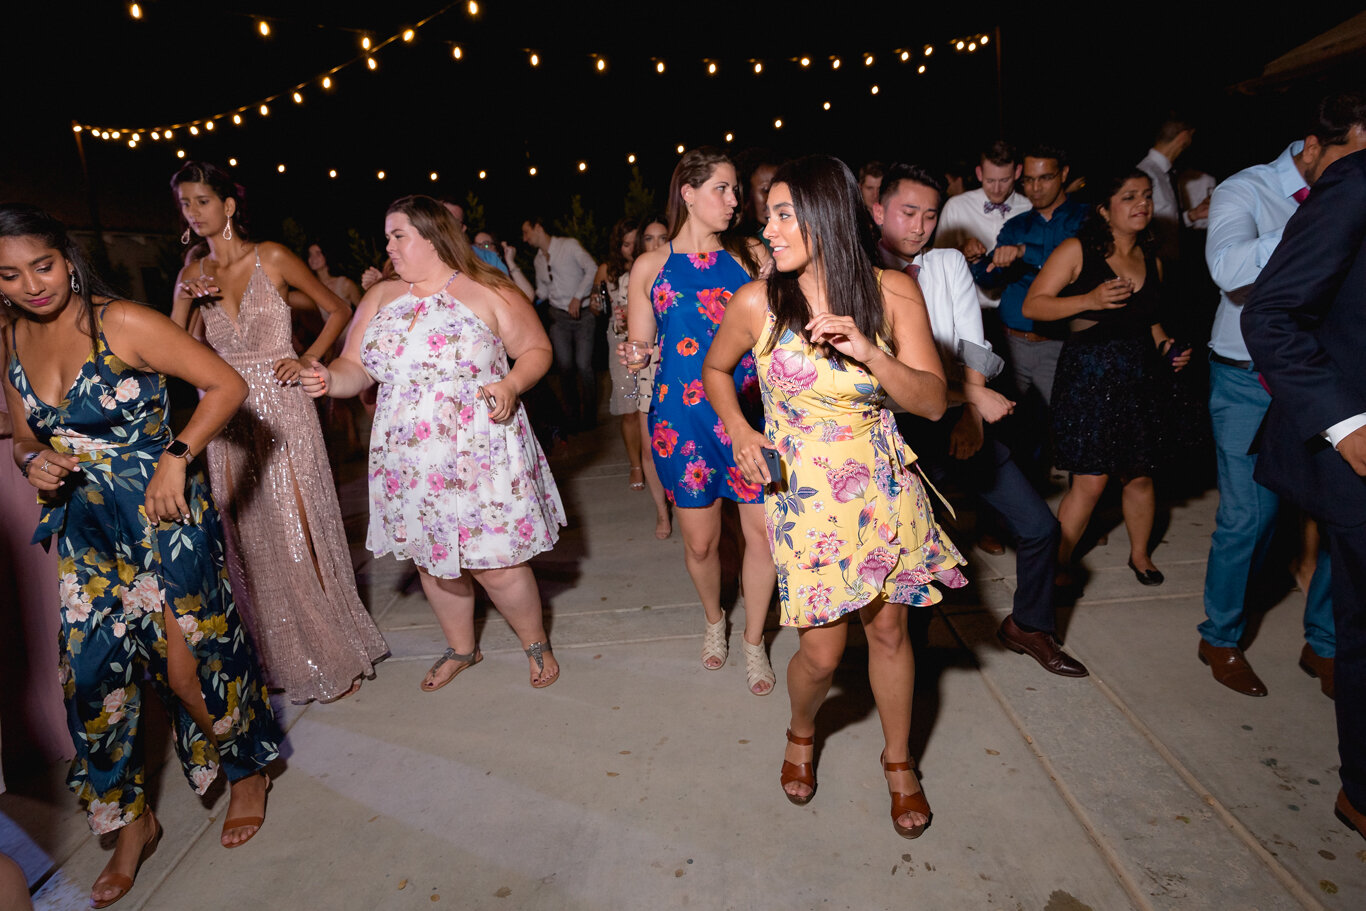 2019.08.24_Emily-Ashir-Wedding-at-the-Maples-6530.jpg